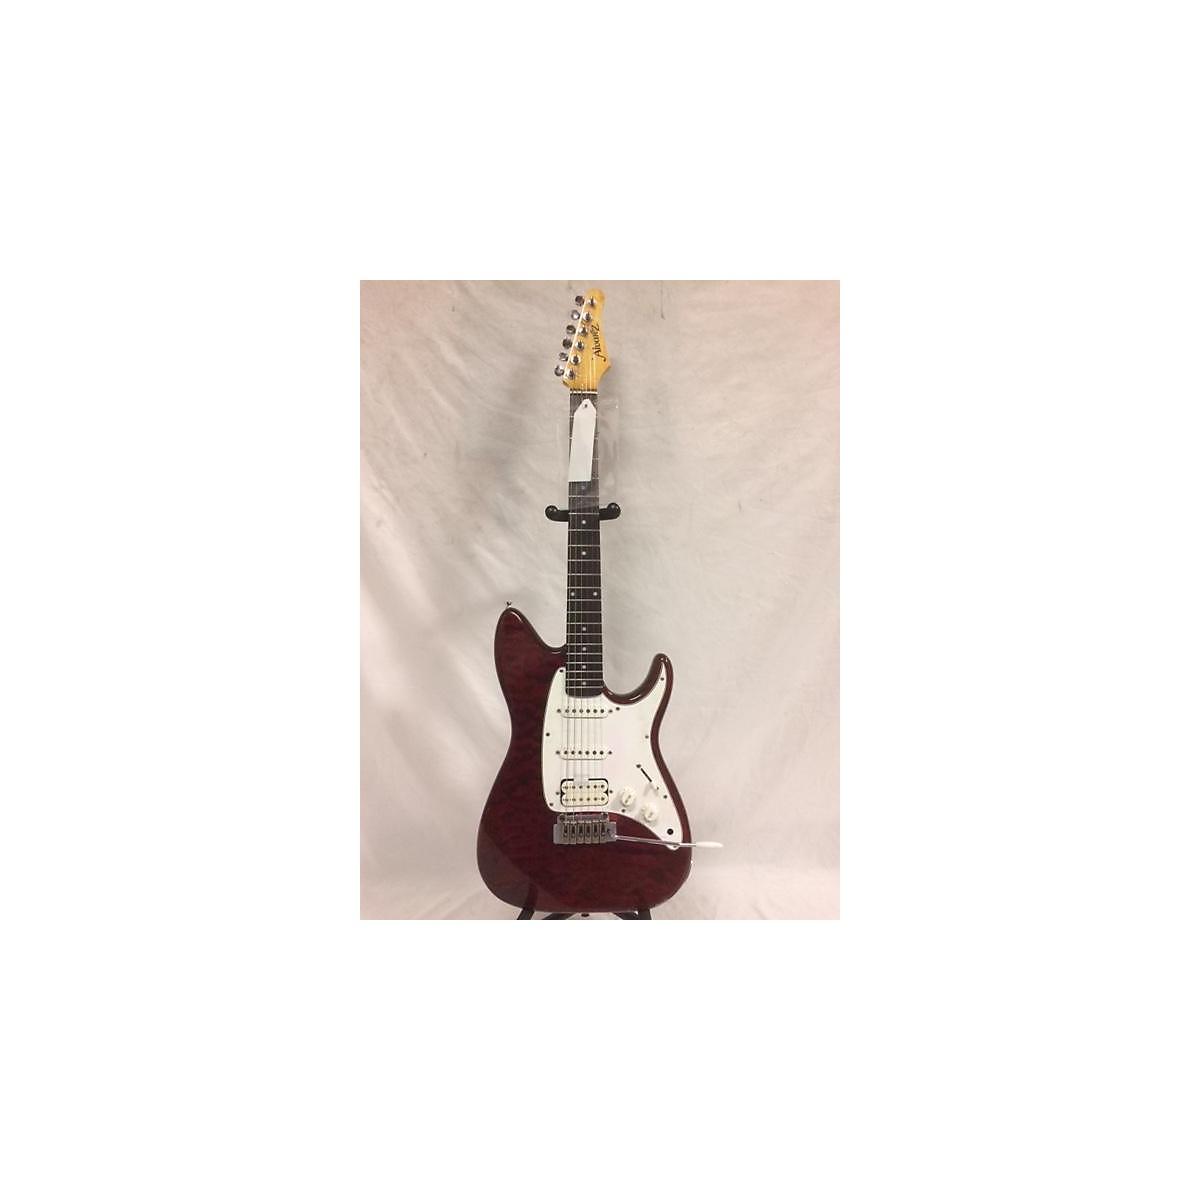 Alvarez Custom Classic Solid Body Electric Guitar